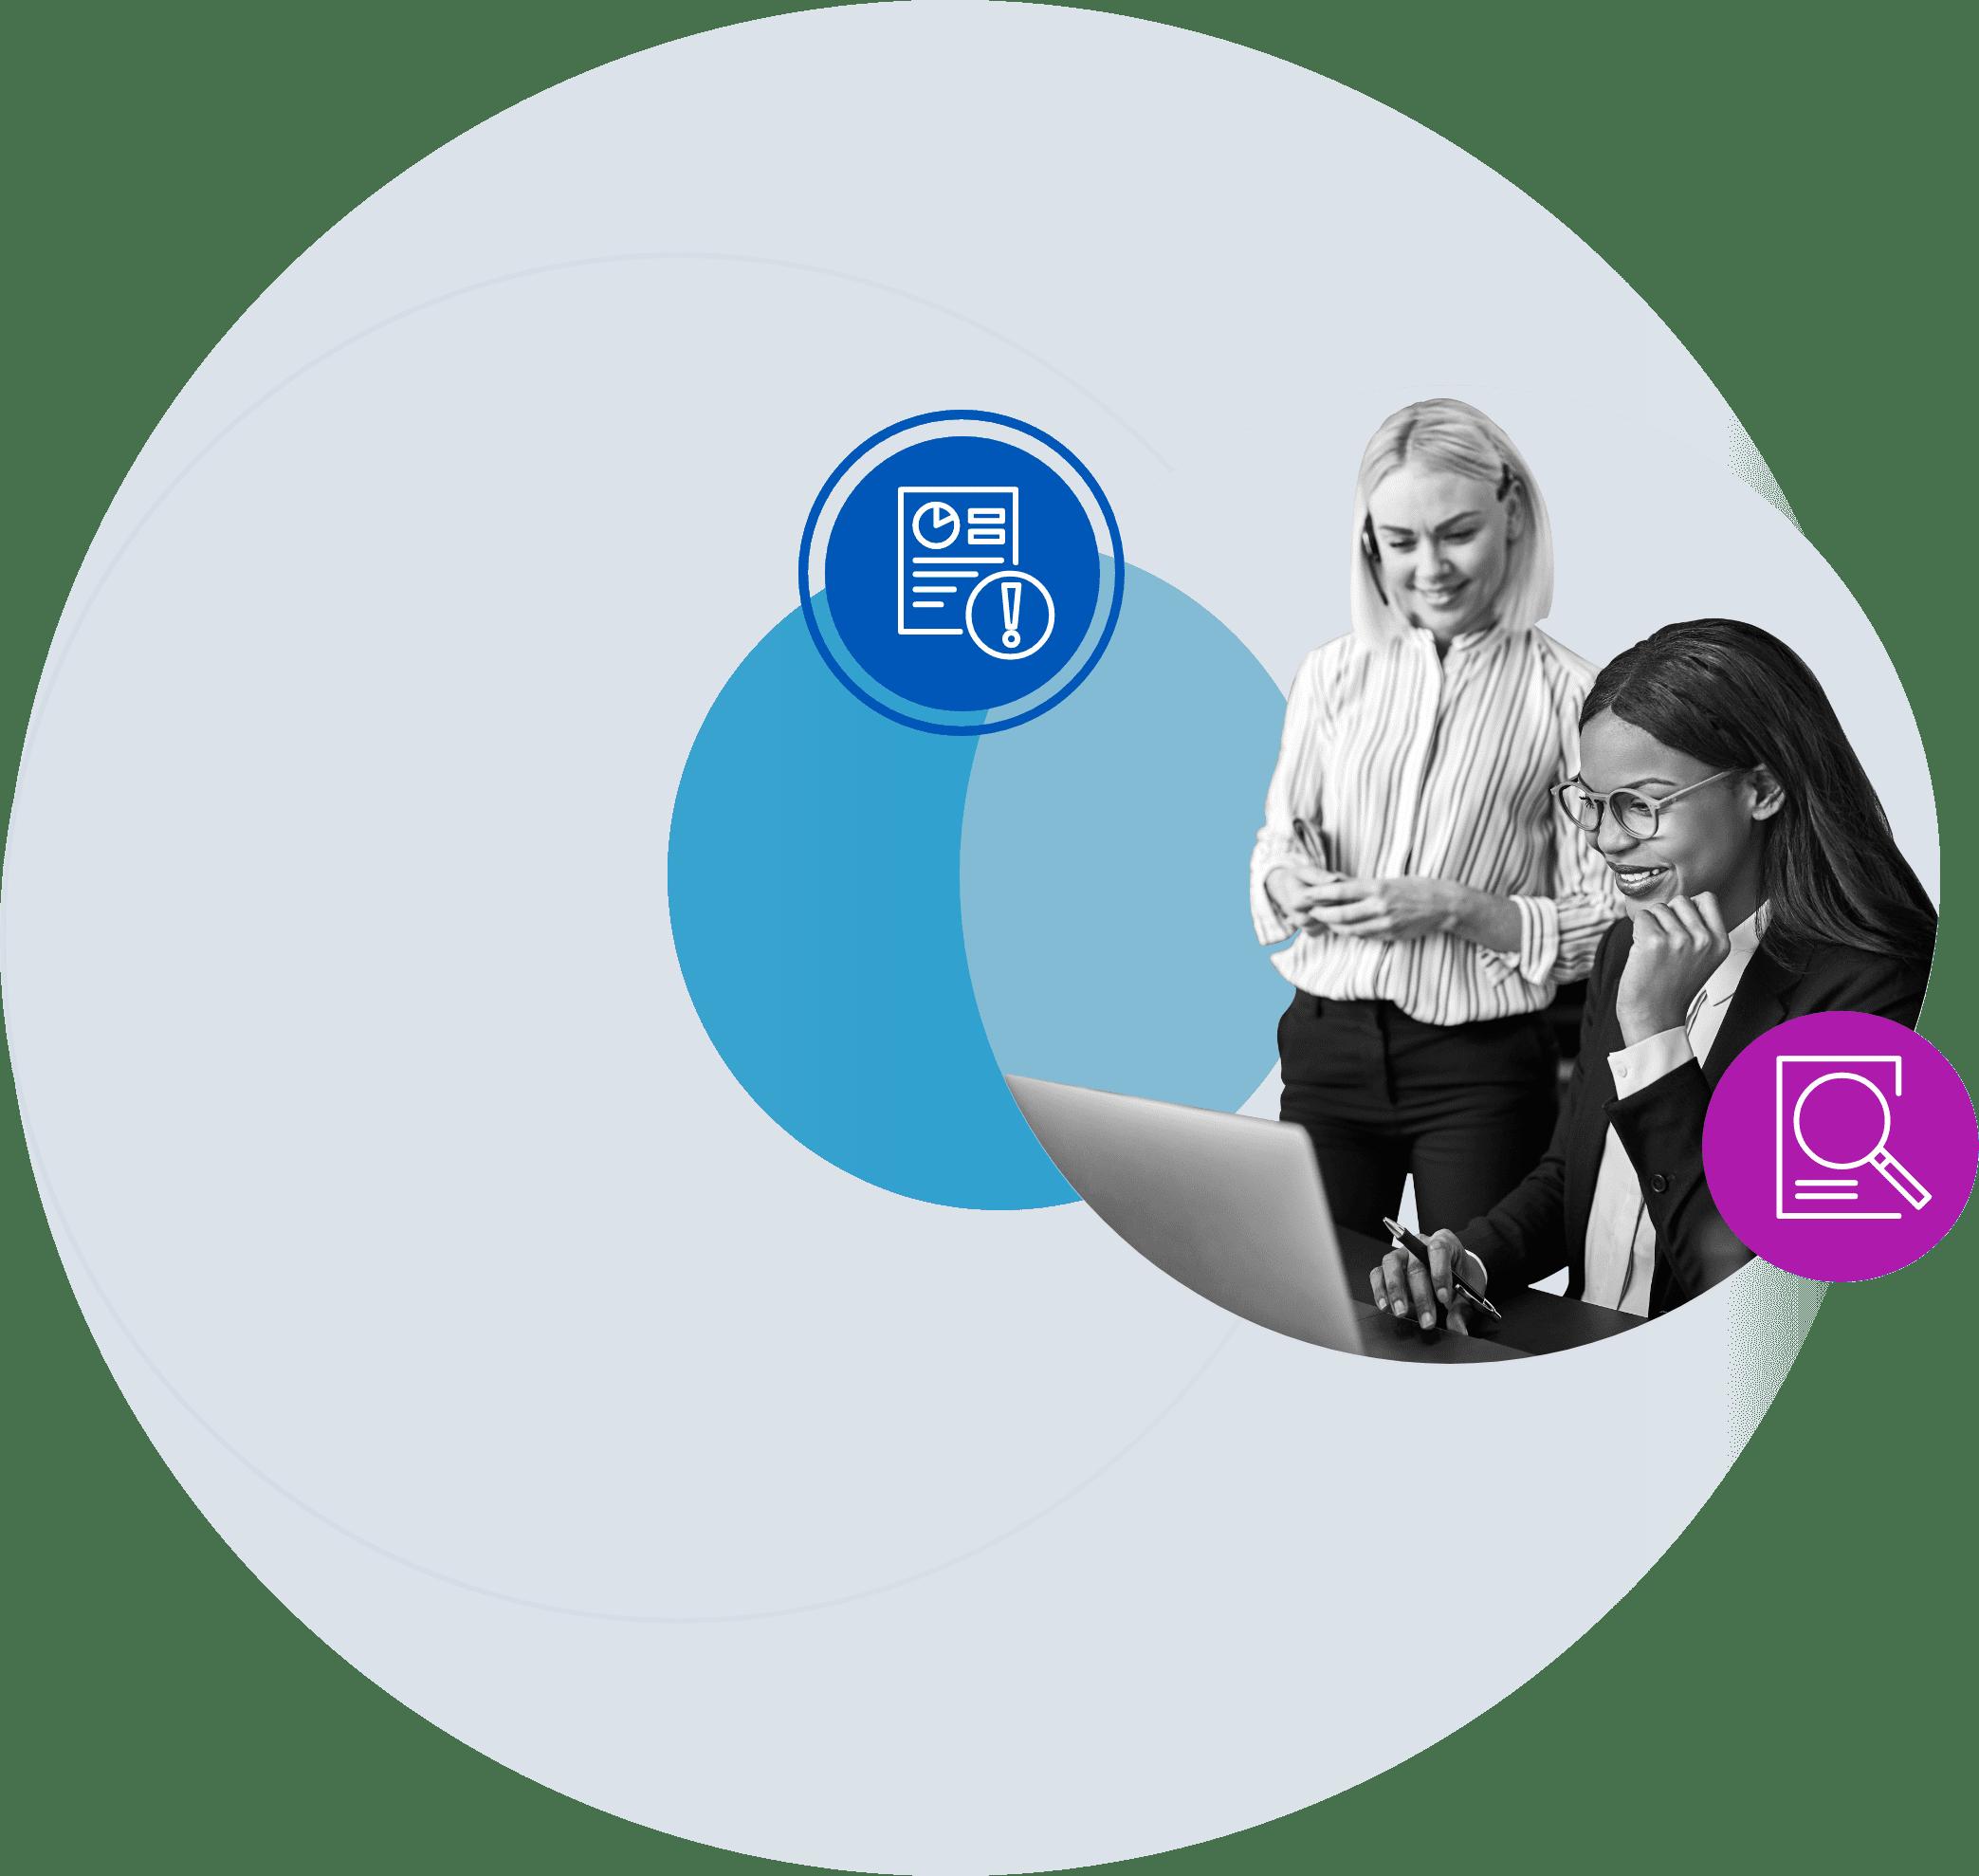 Venn provides audit-ready compliance assurance